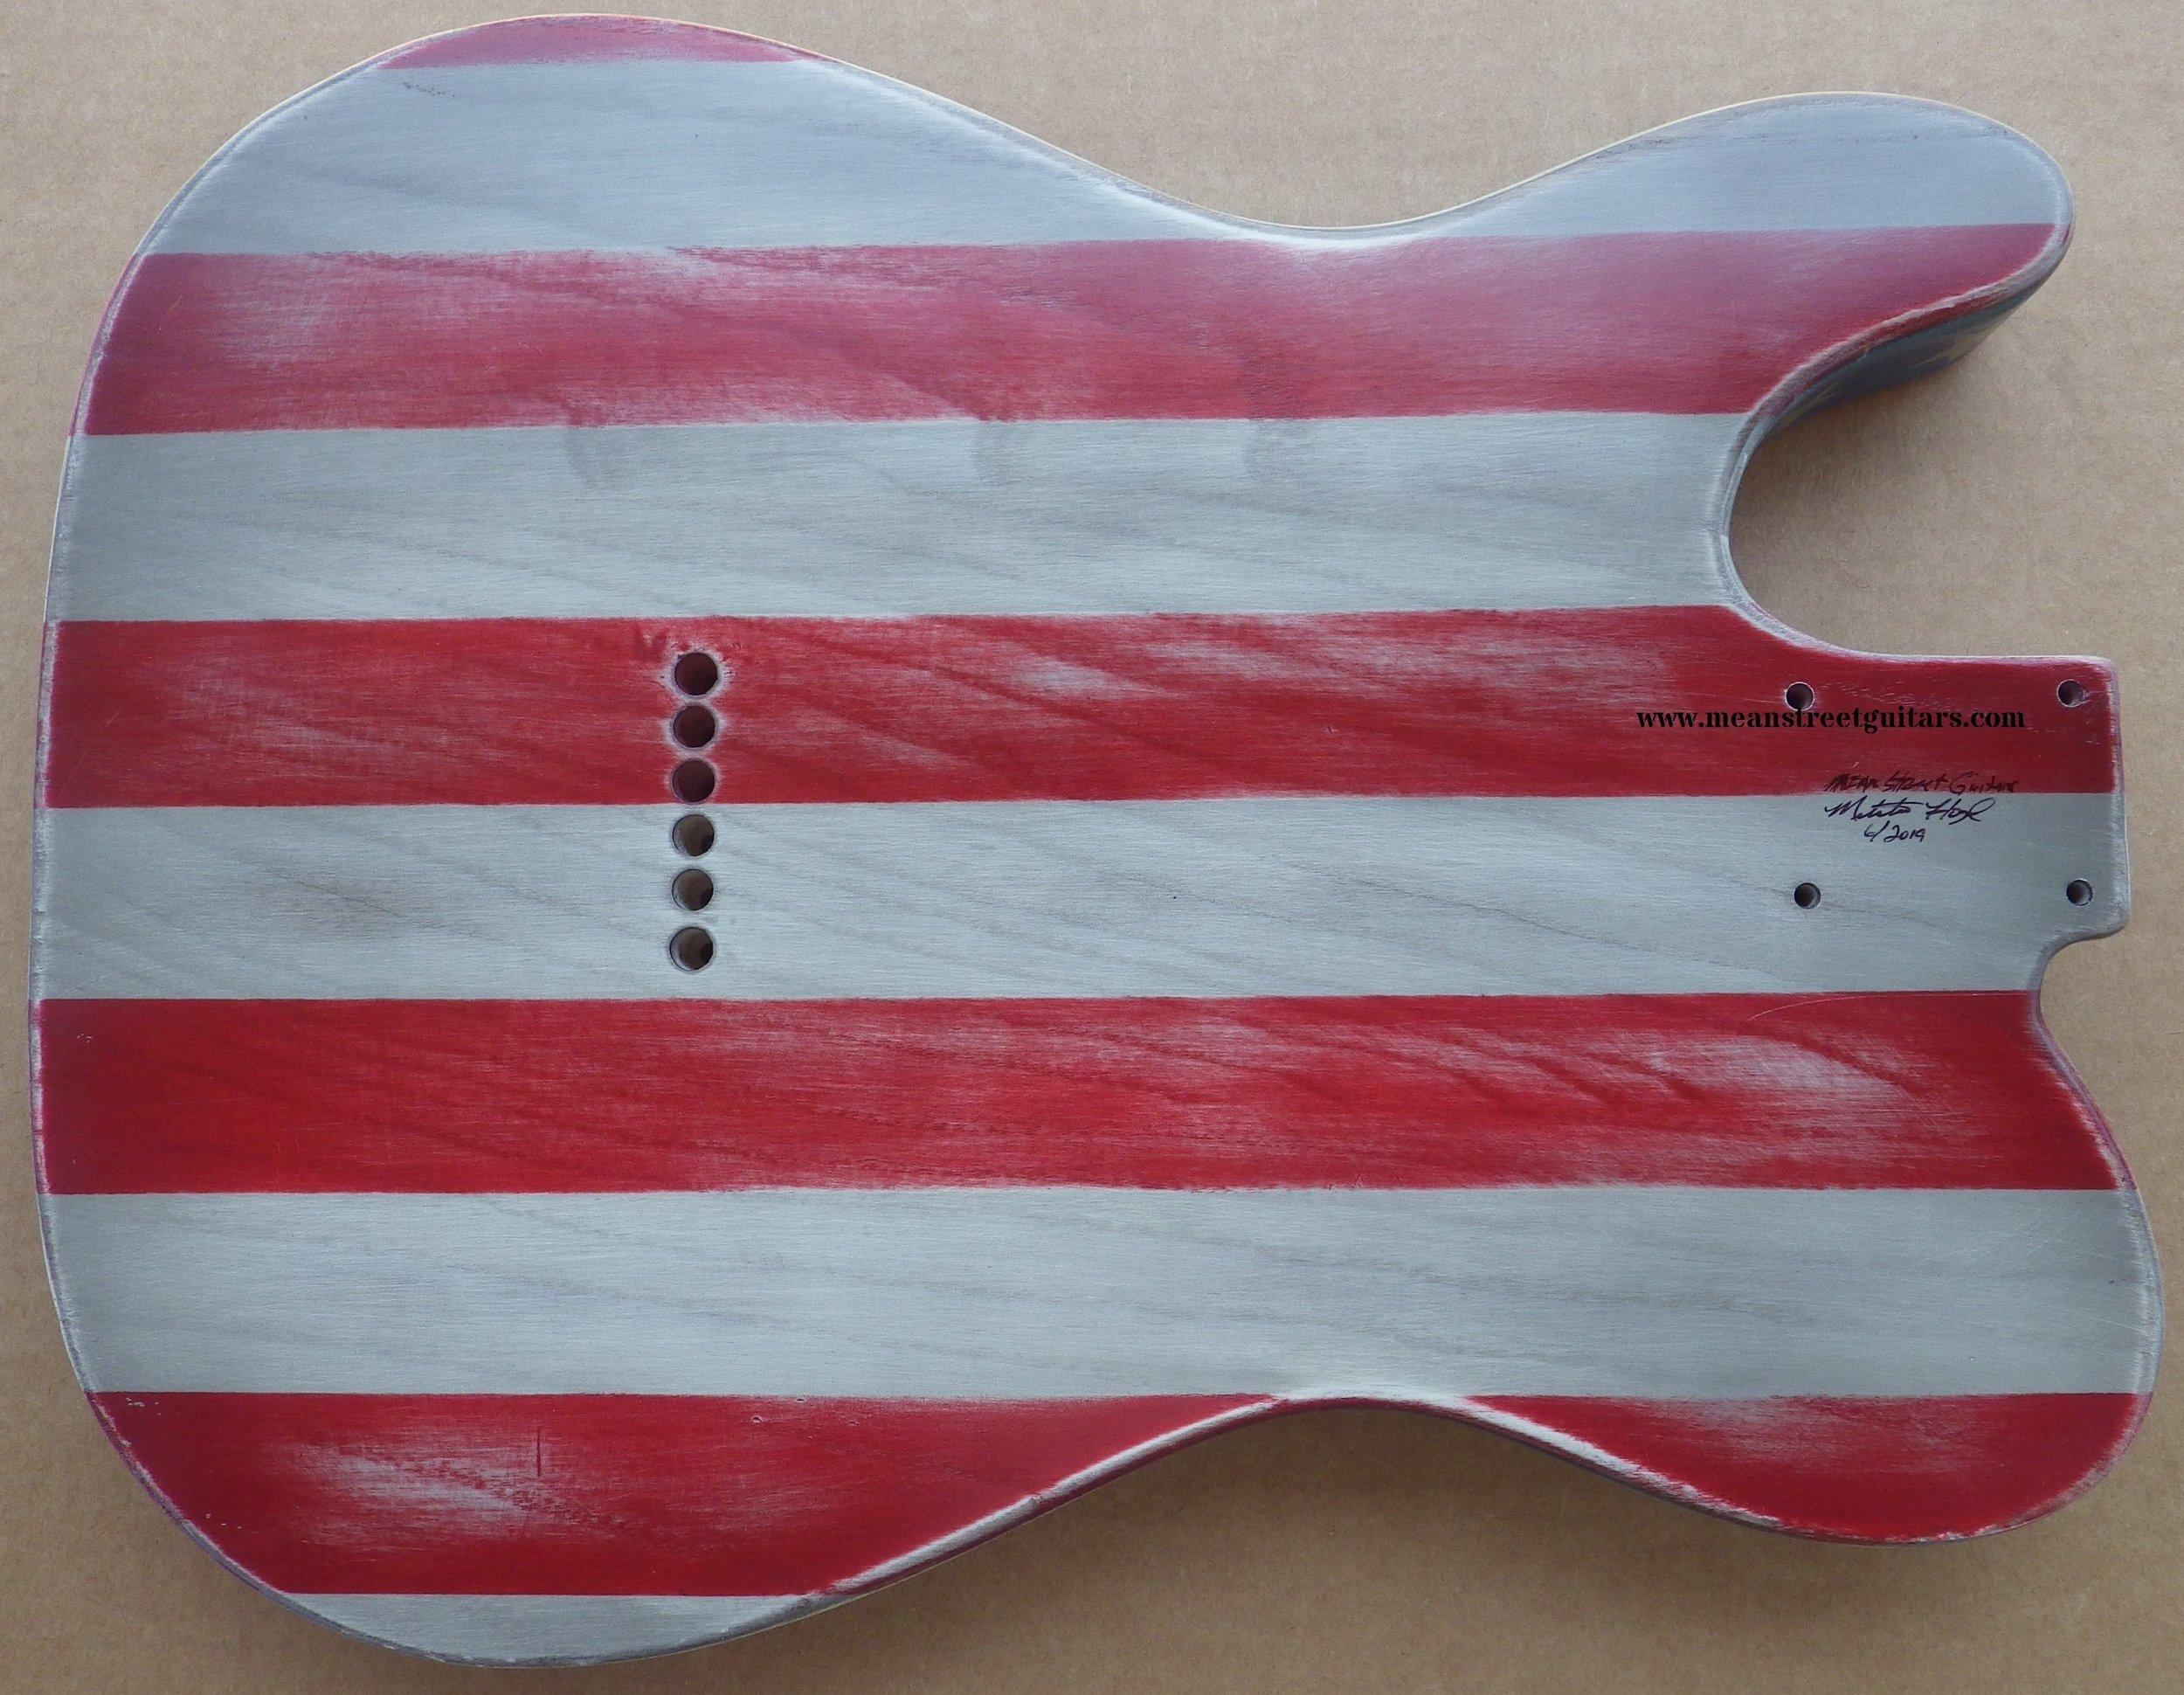 Mean Street American Flag Tele relic paint job Shawne P pic 8a.jpg